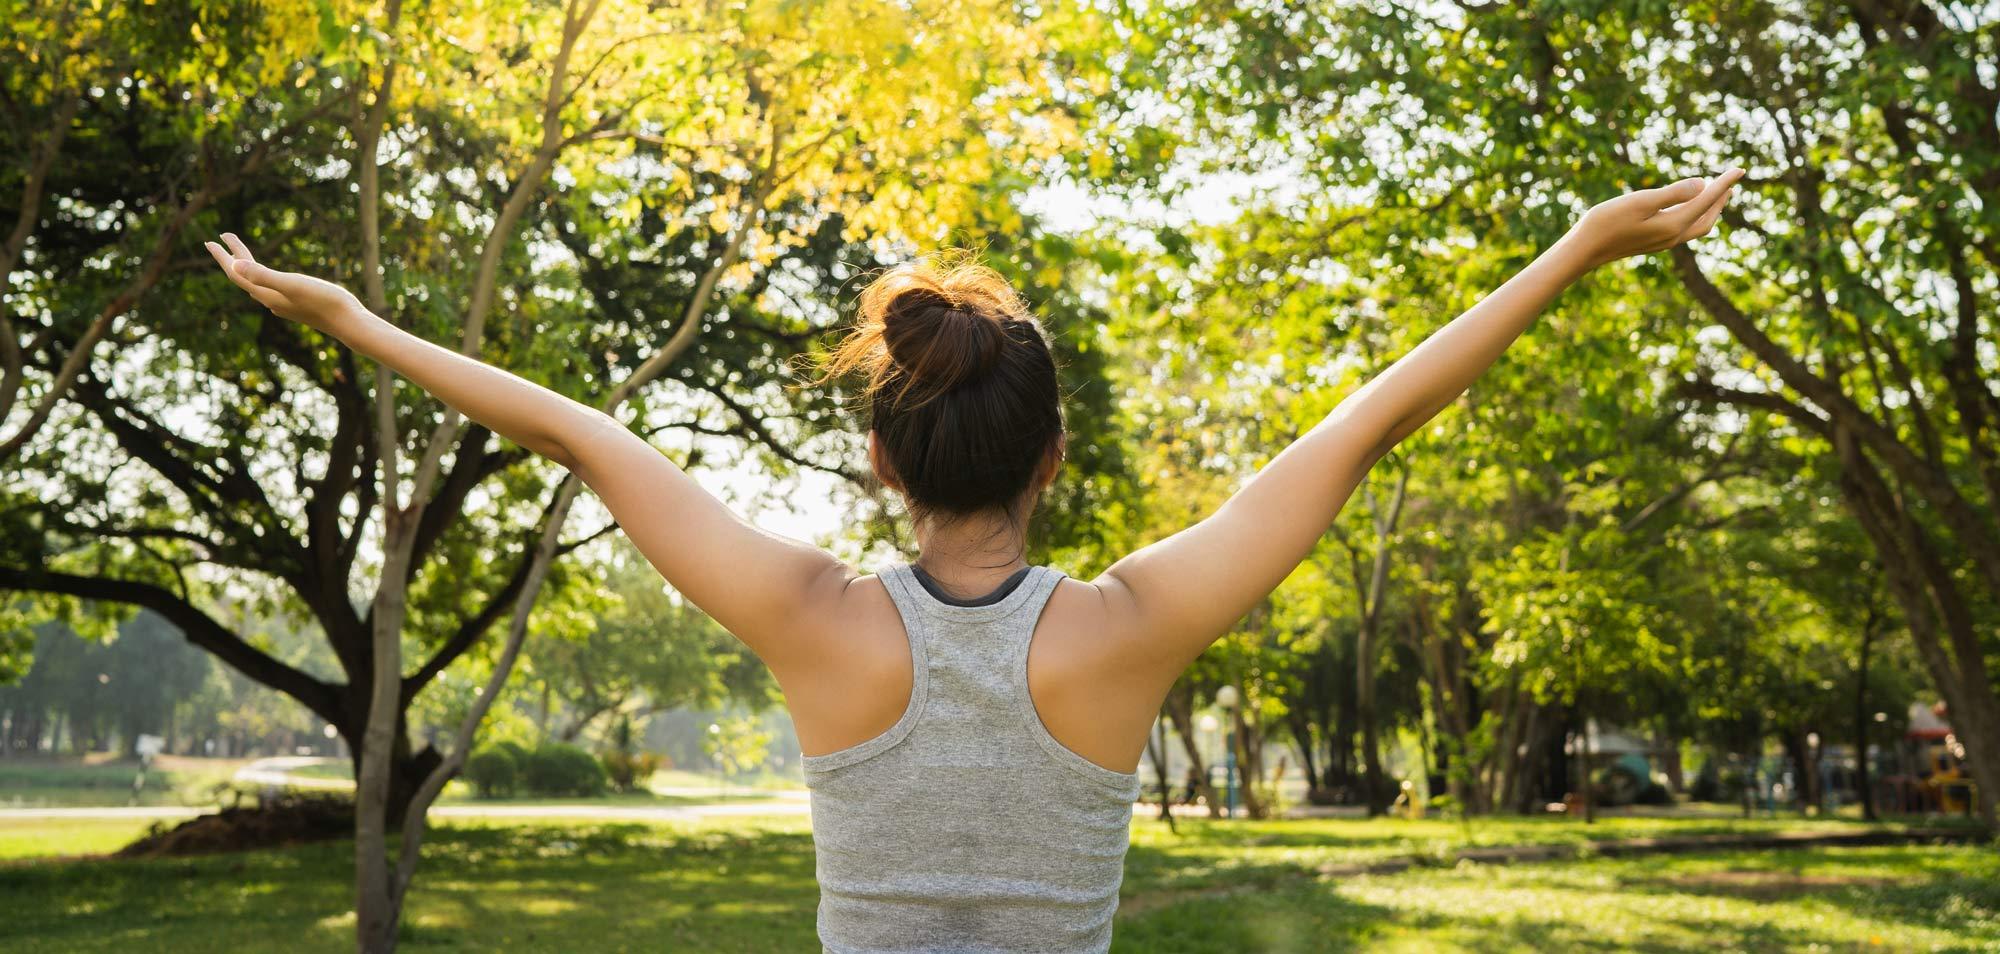 Health-Conscious Living